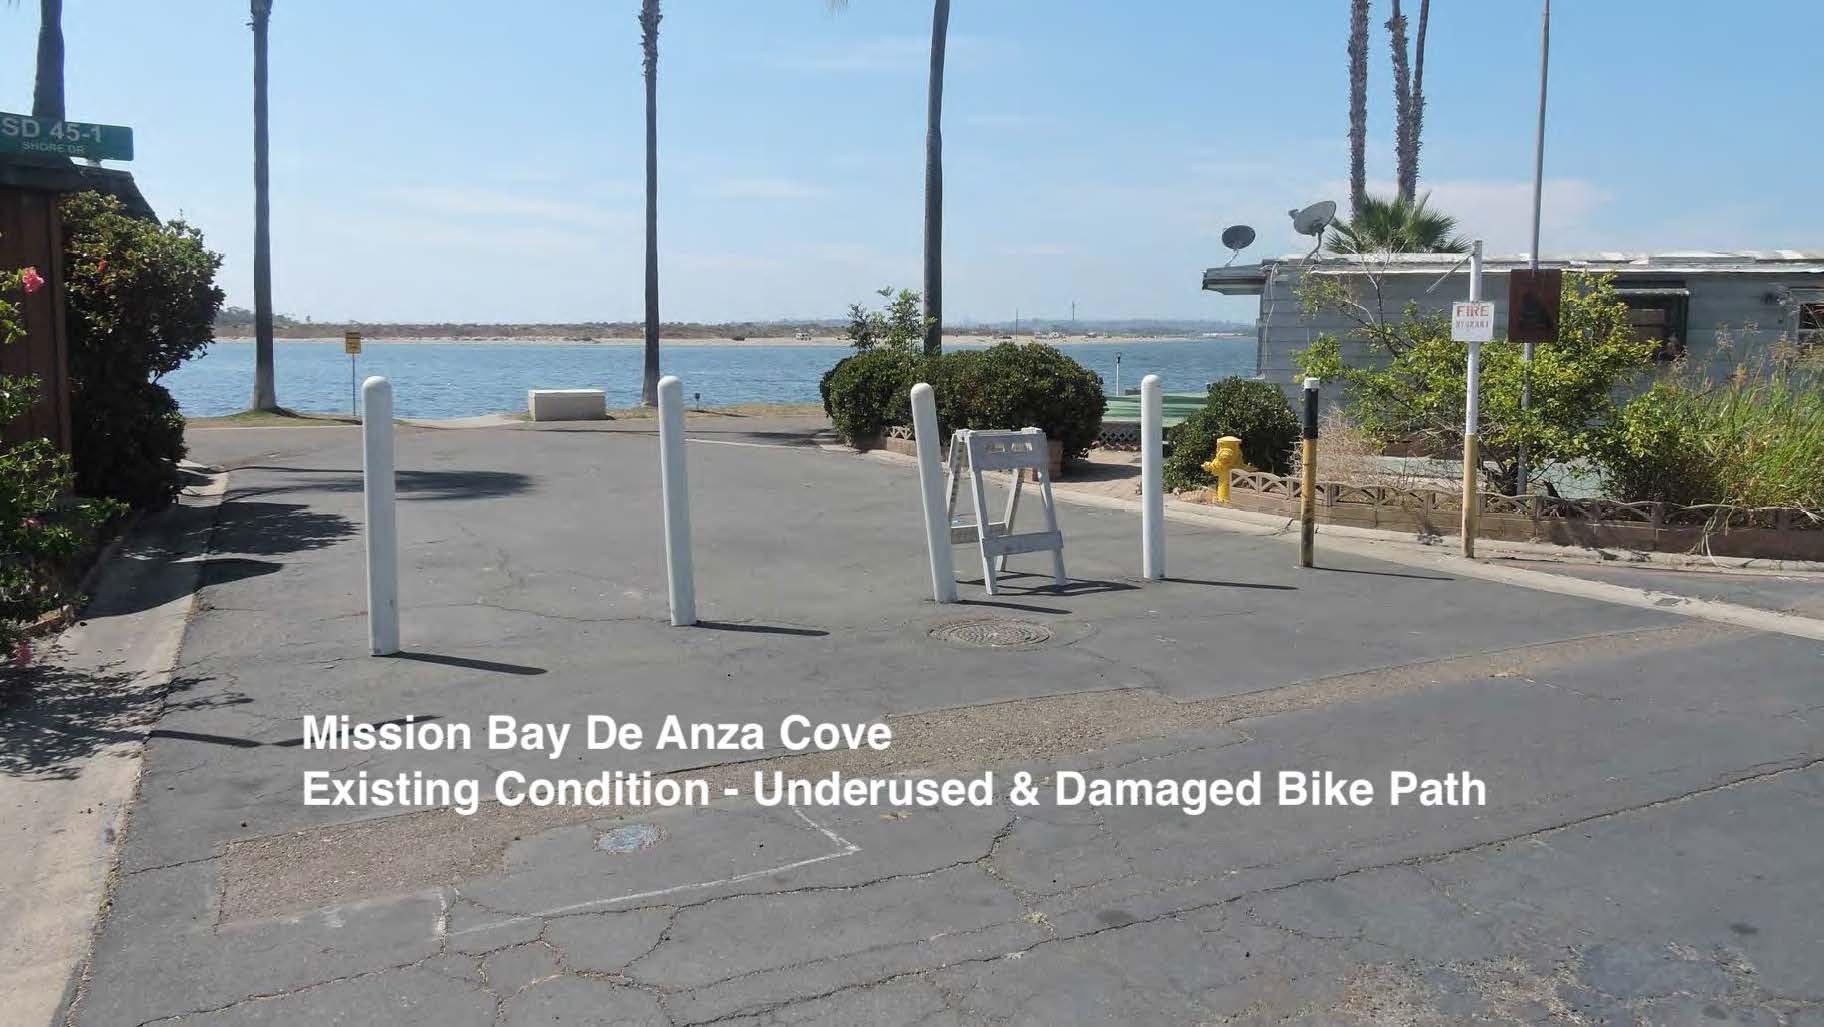 De Anza Coove current bike path cnodition